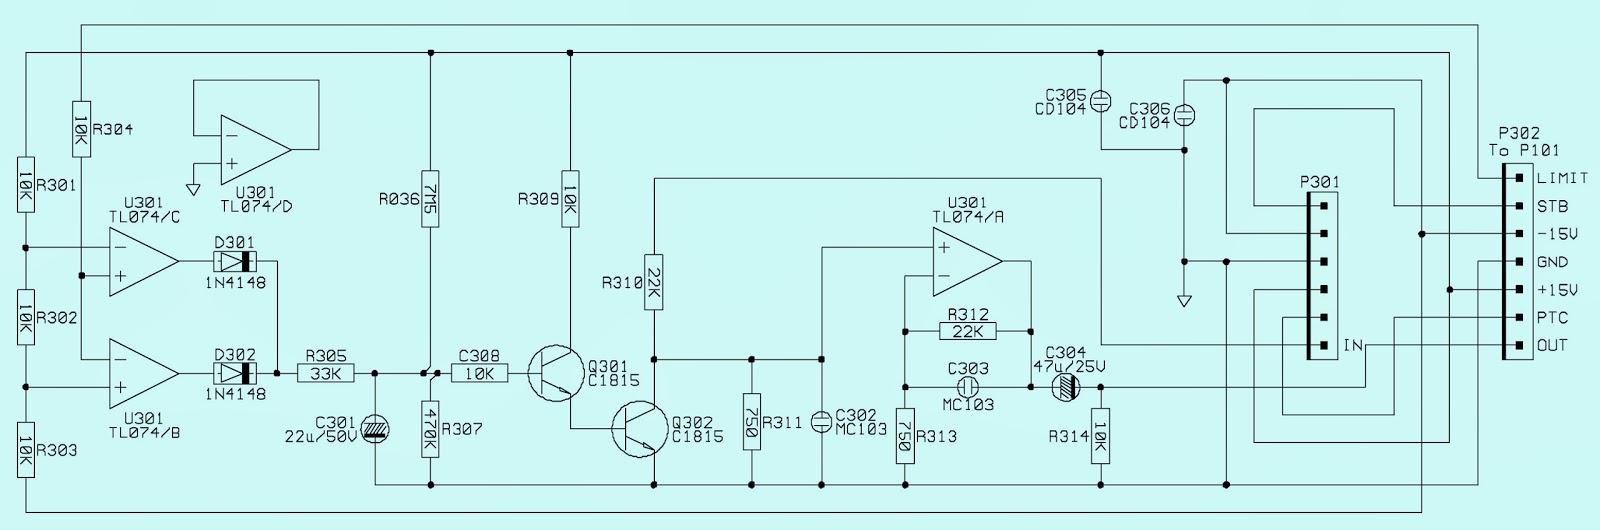 jbl sub 135s cinema propack 600 amp subwoofer schematic cinema propack600 ampsubwoofer schematic circuit diagram [ 1600 x 530 Pixel ]